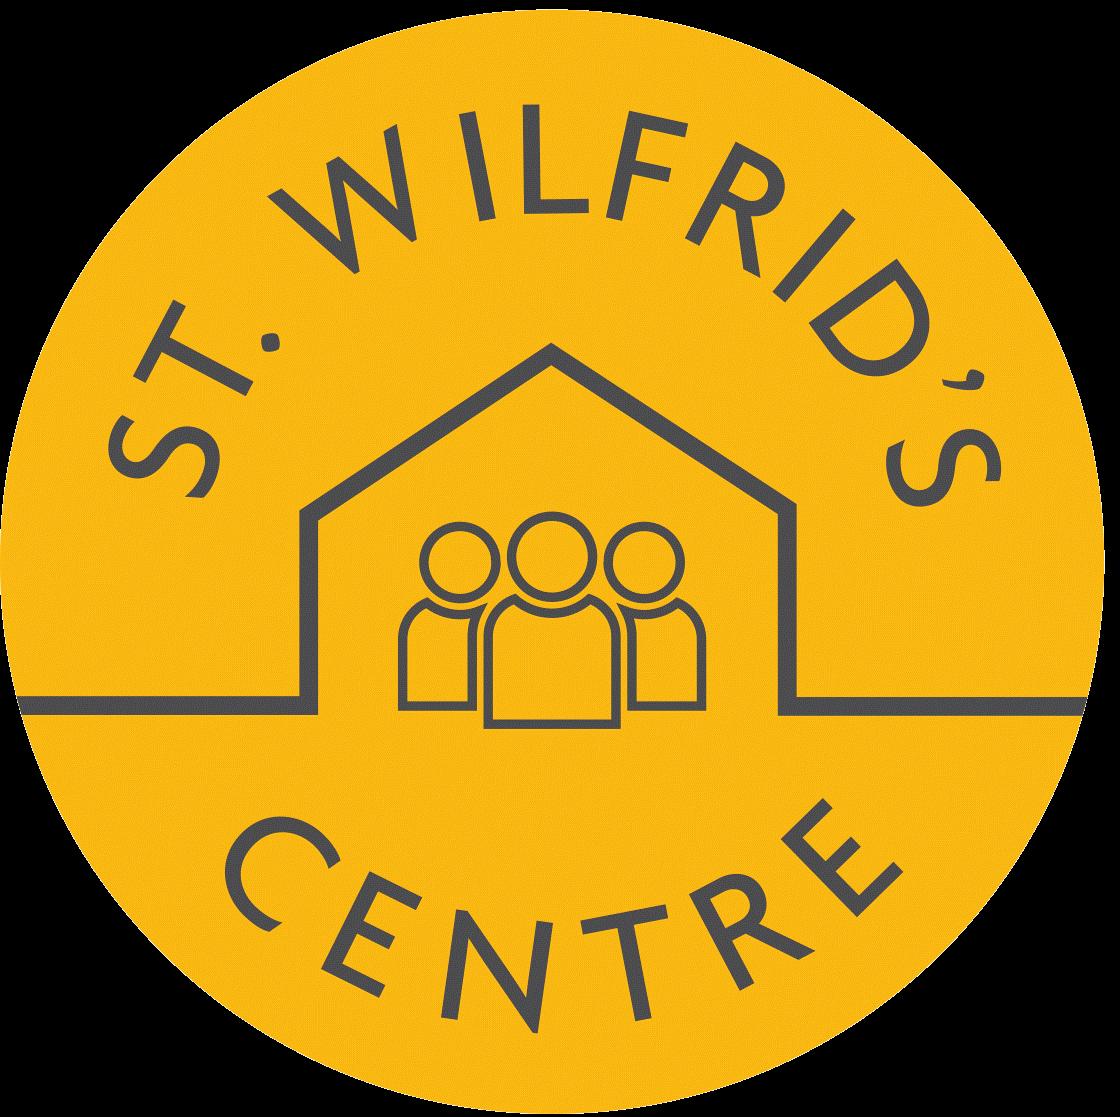 St Wilfrid Centre Logo PNG transparent